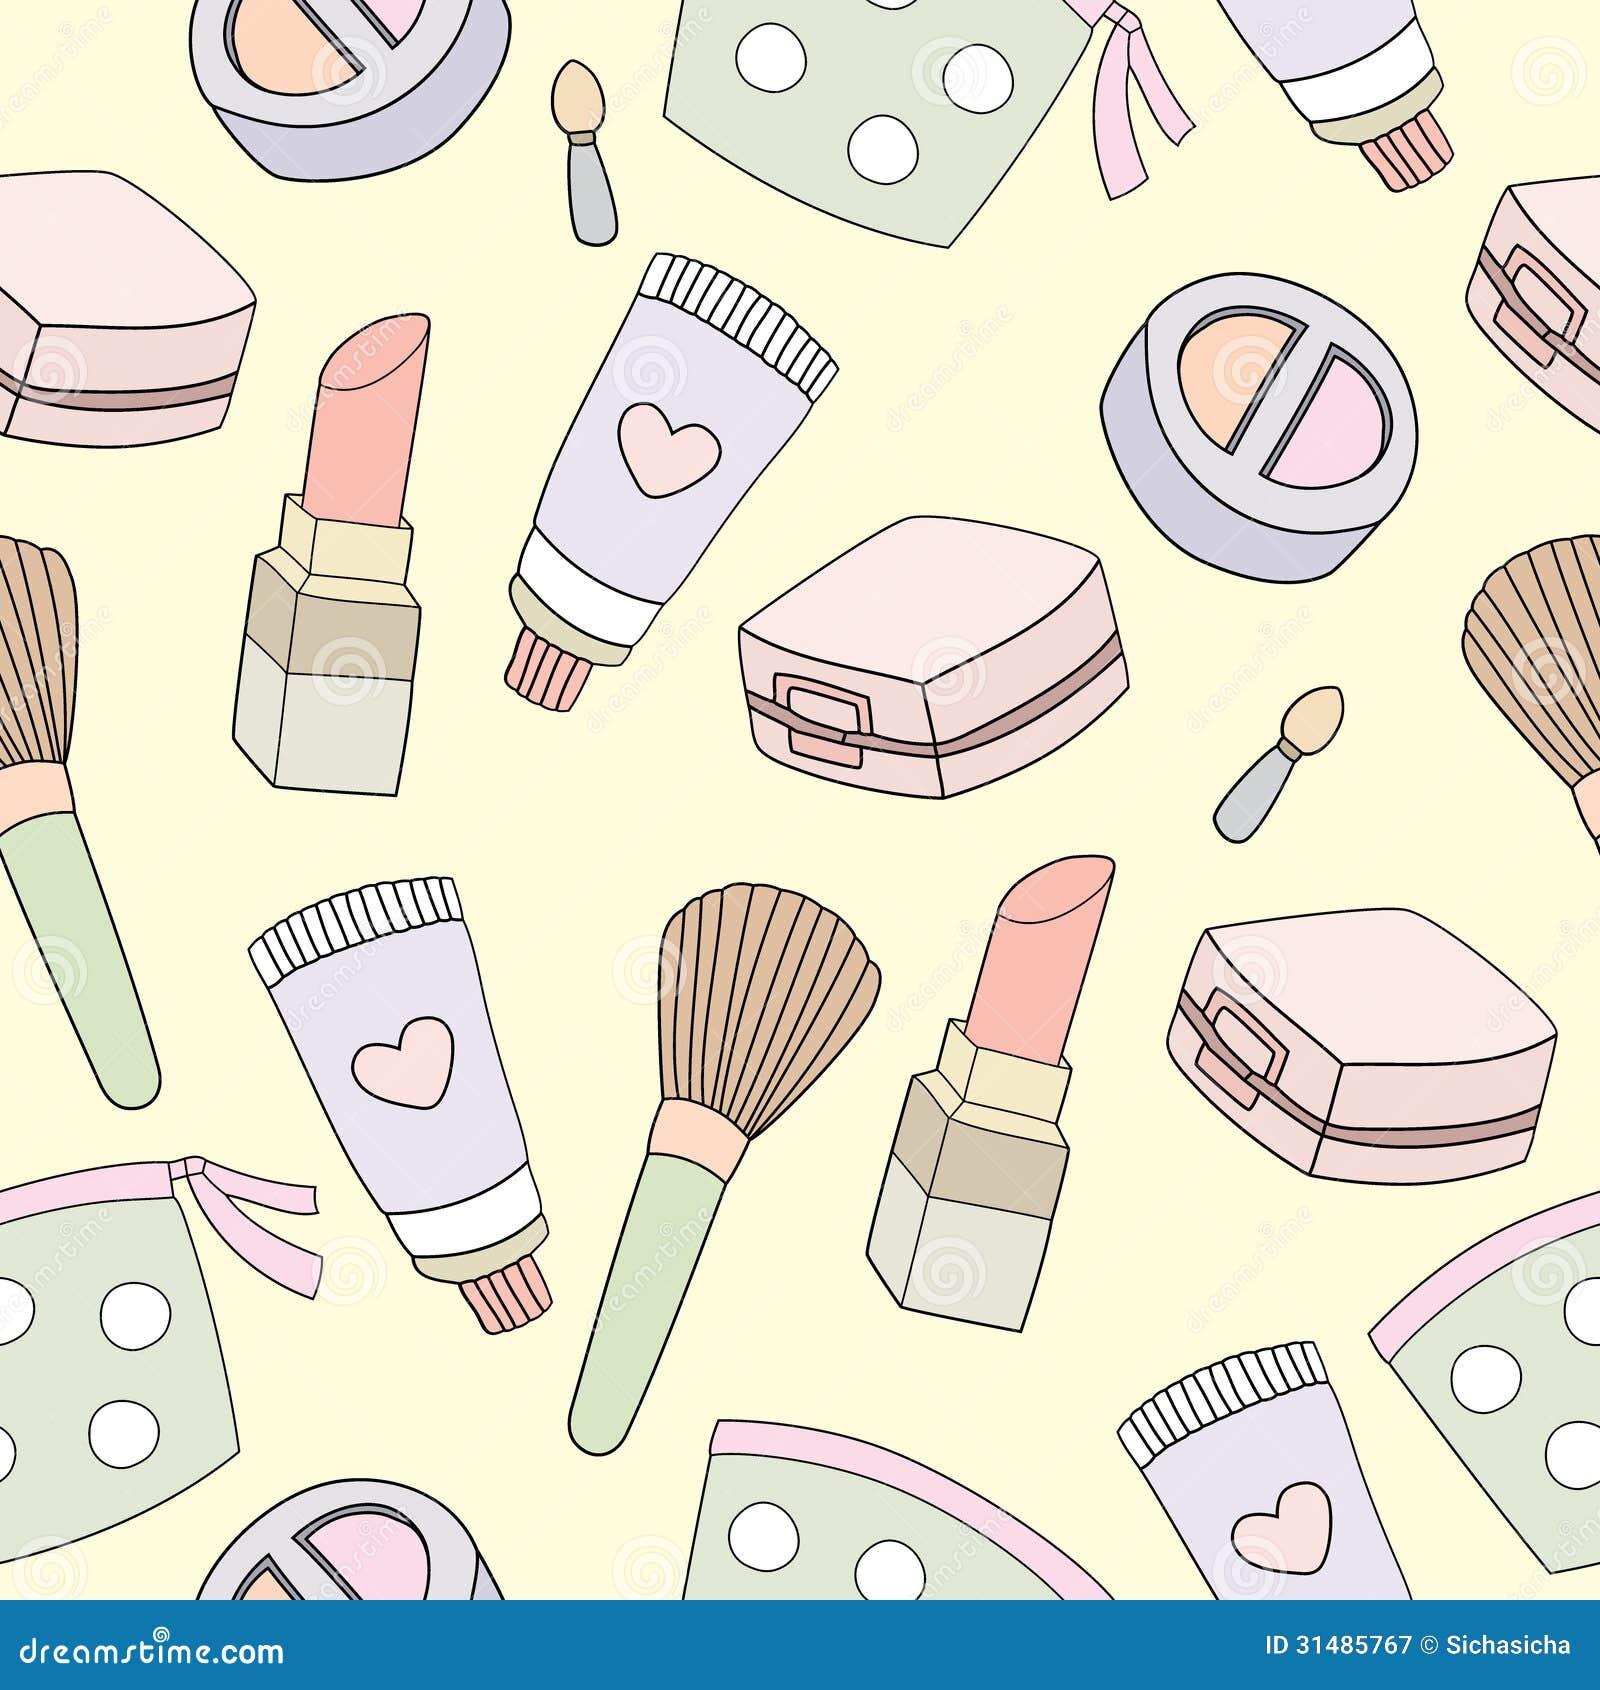 download wallpaper of lipsticks